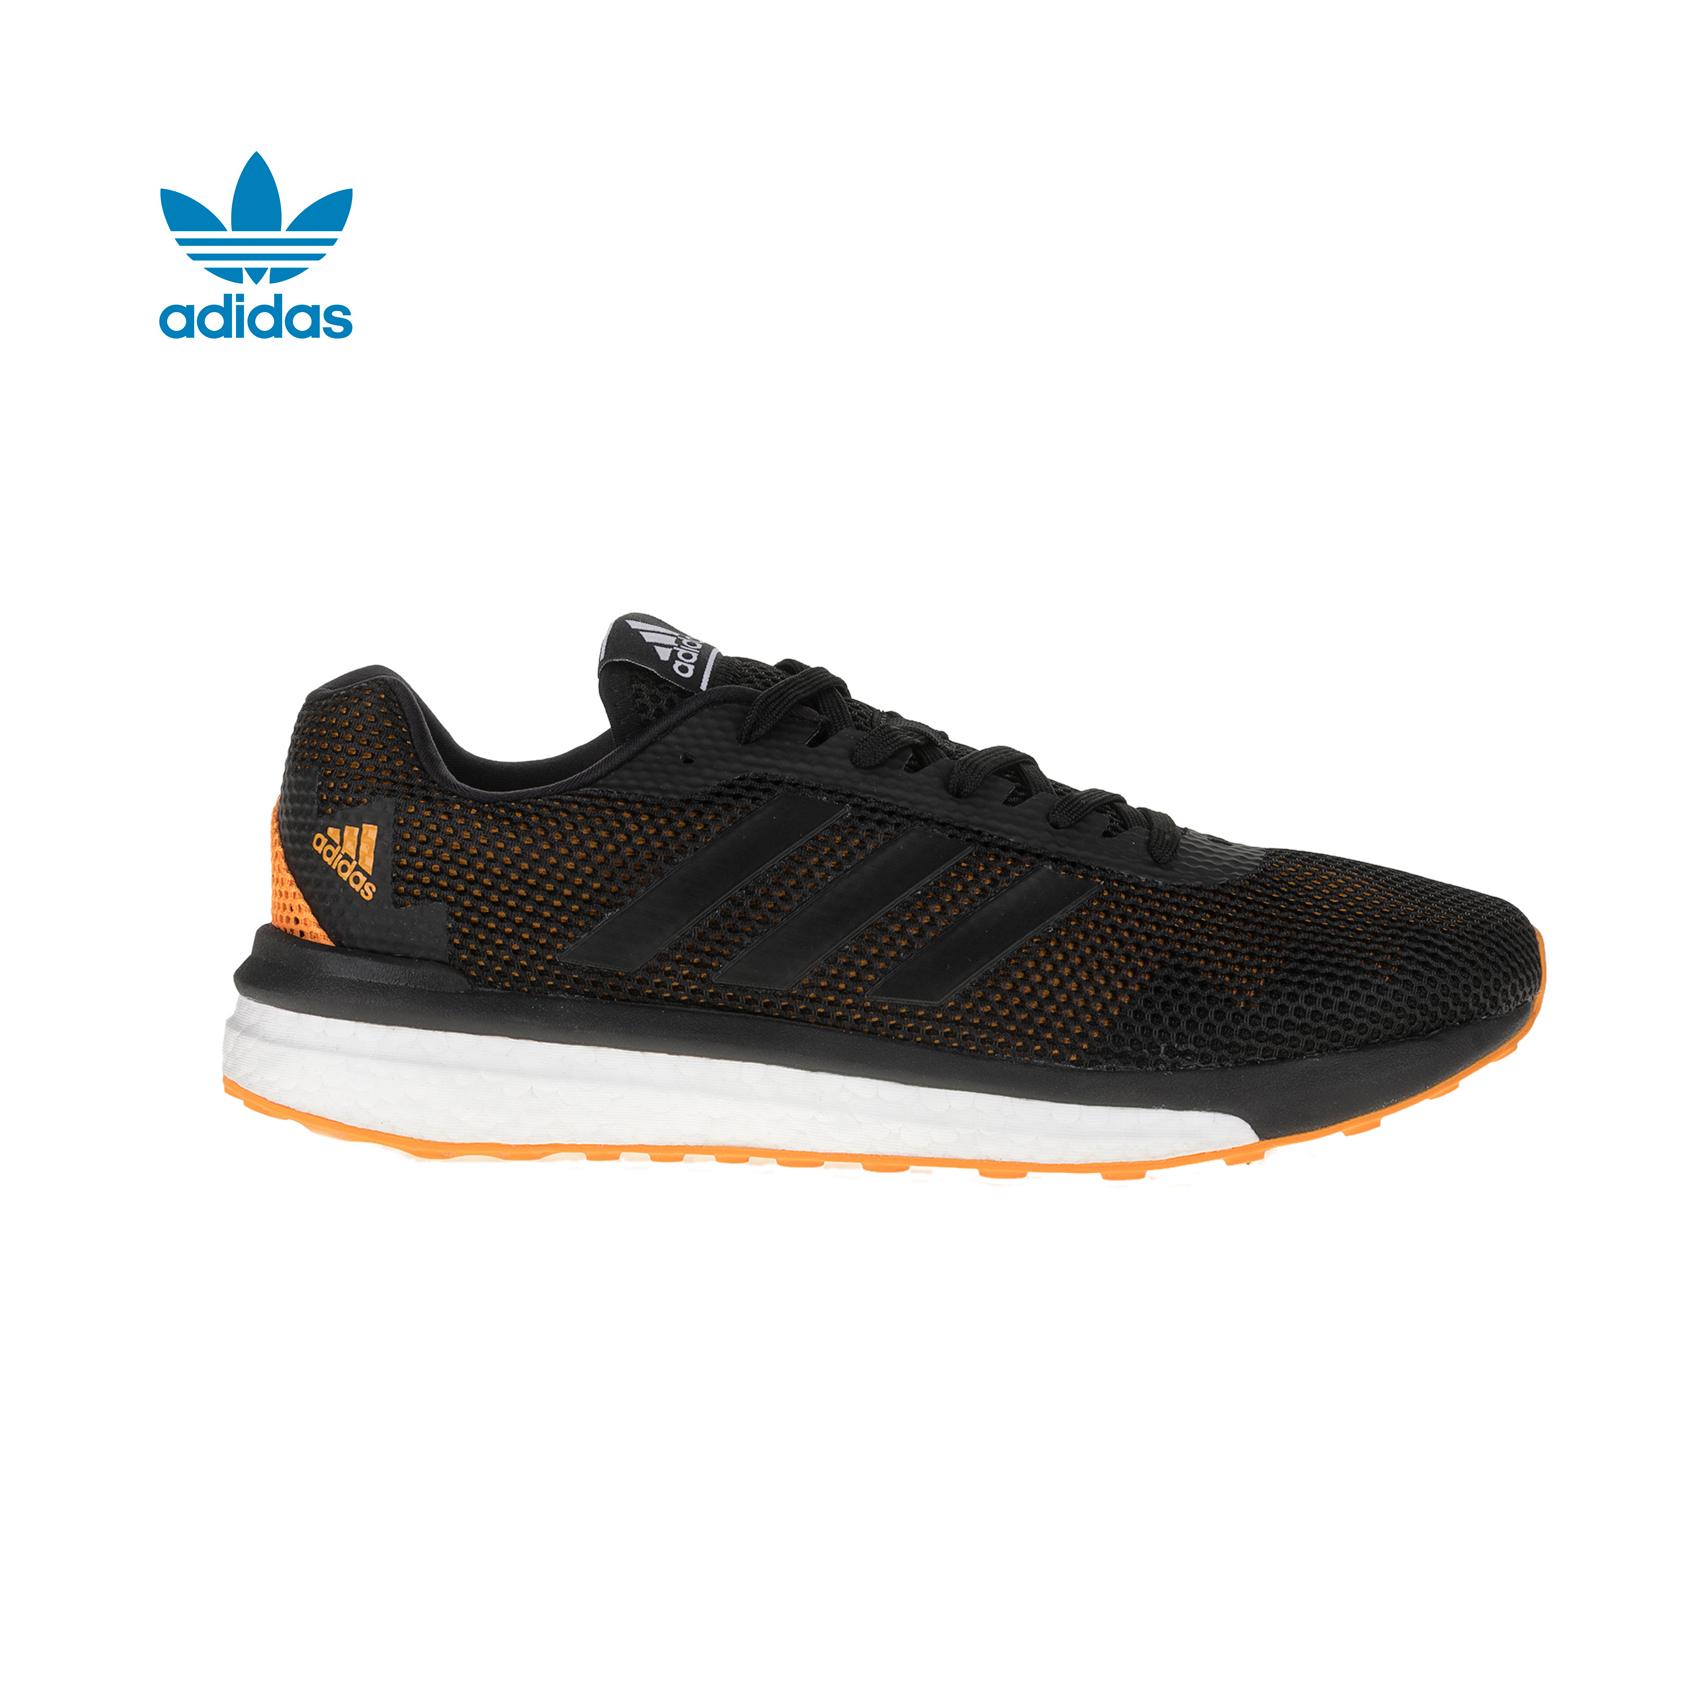 b5978eecab9 adidas Originals - Ανδρικά παπούτσια adidas vengeful μαύρα